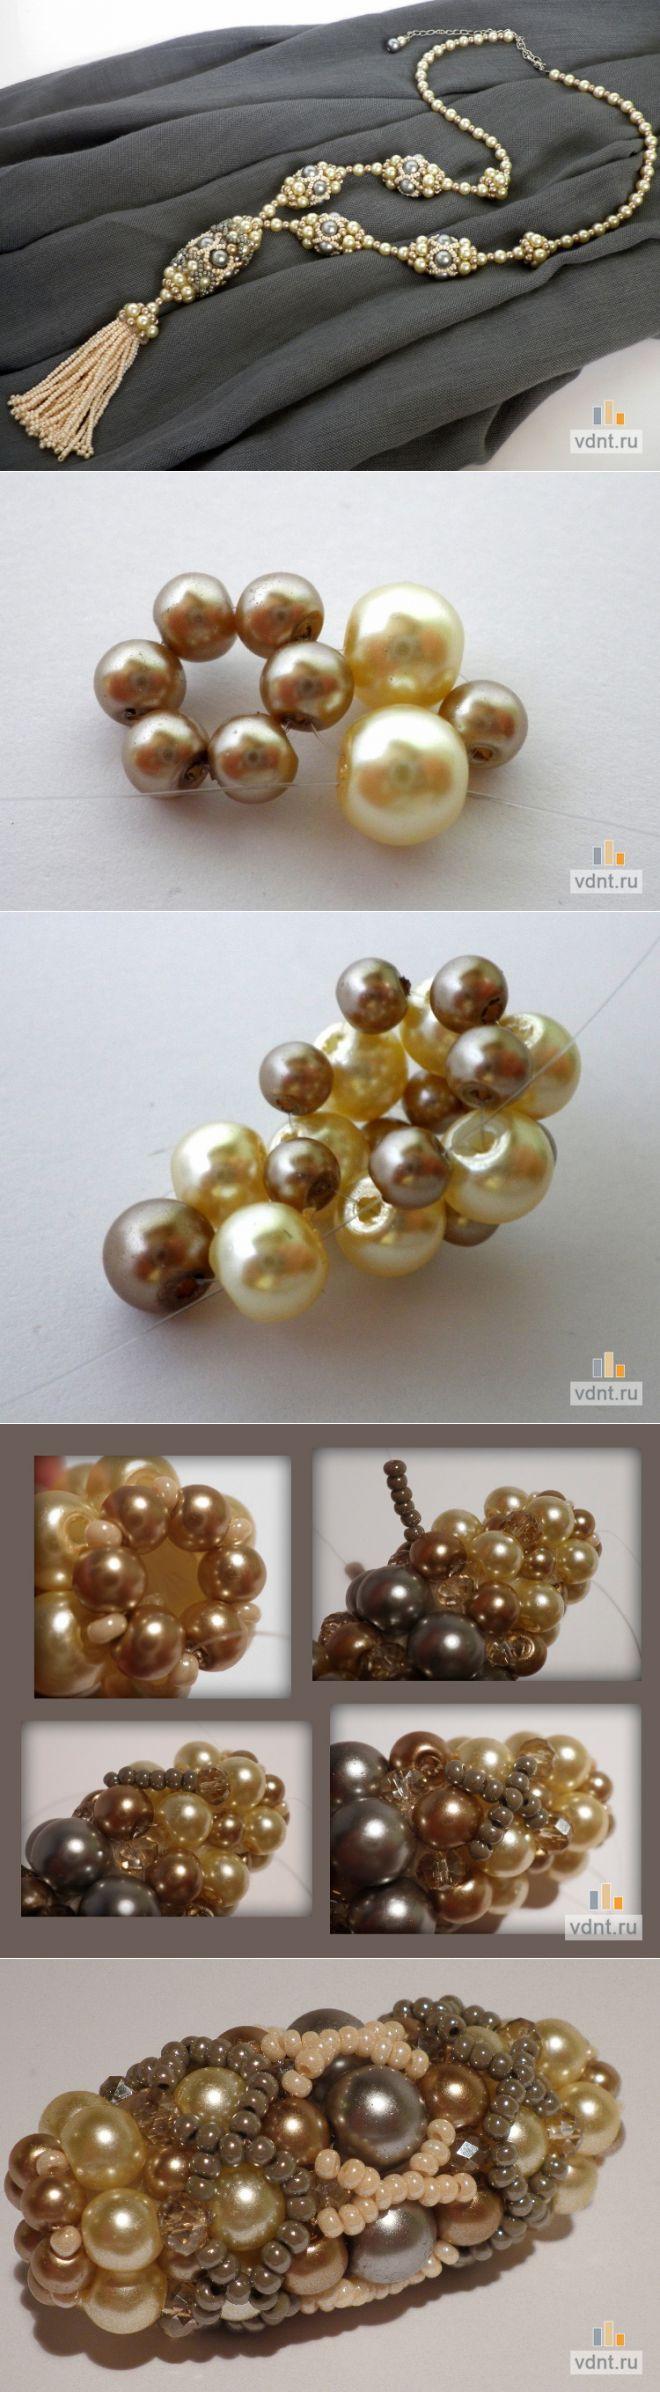 Kette aus Beads